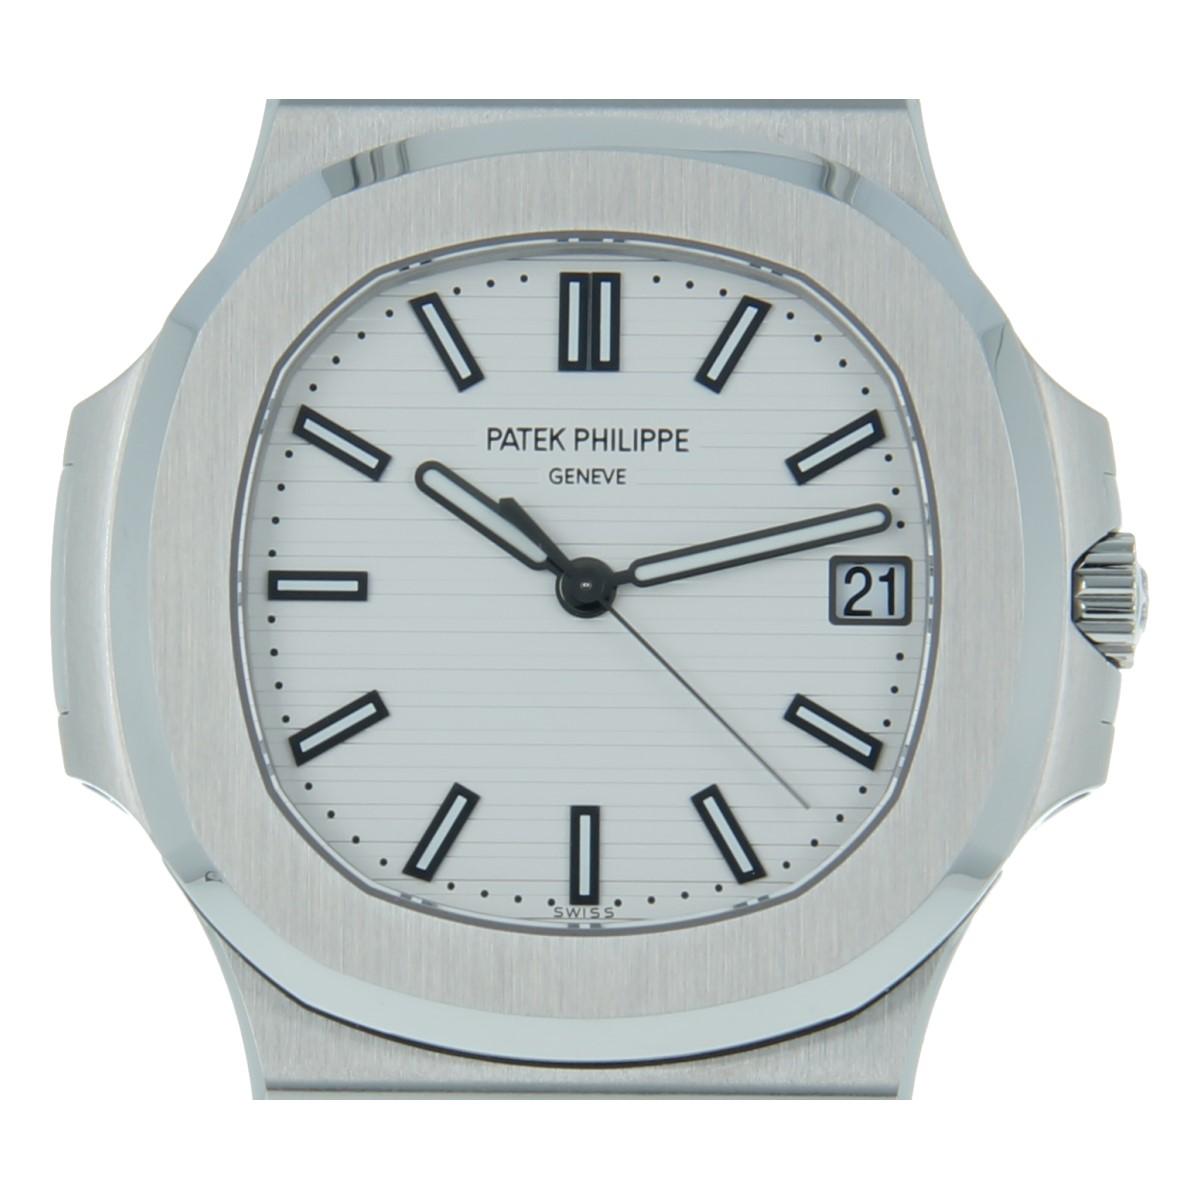 11a4ac966b1 Patek Philippe Nautilus 5711/1A-011 *Brand-new*   Buy second-hand ...